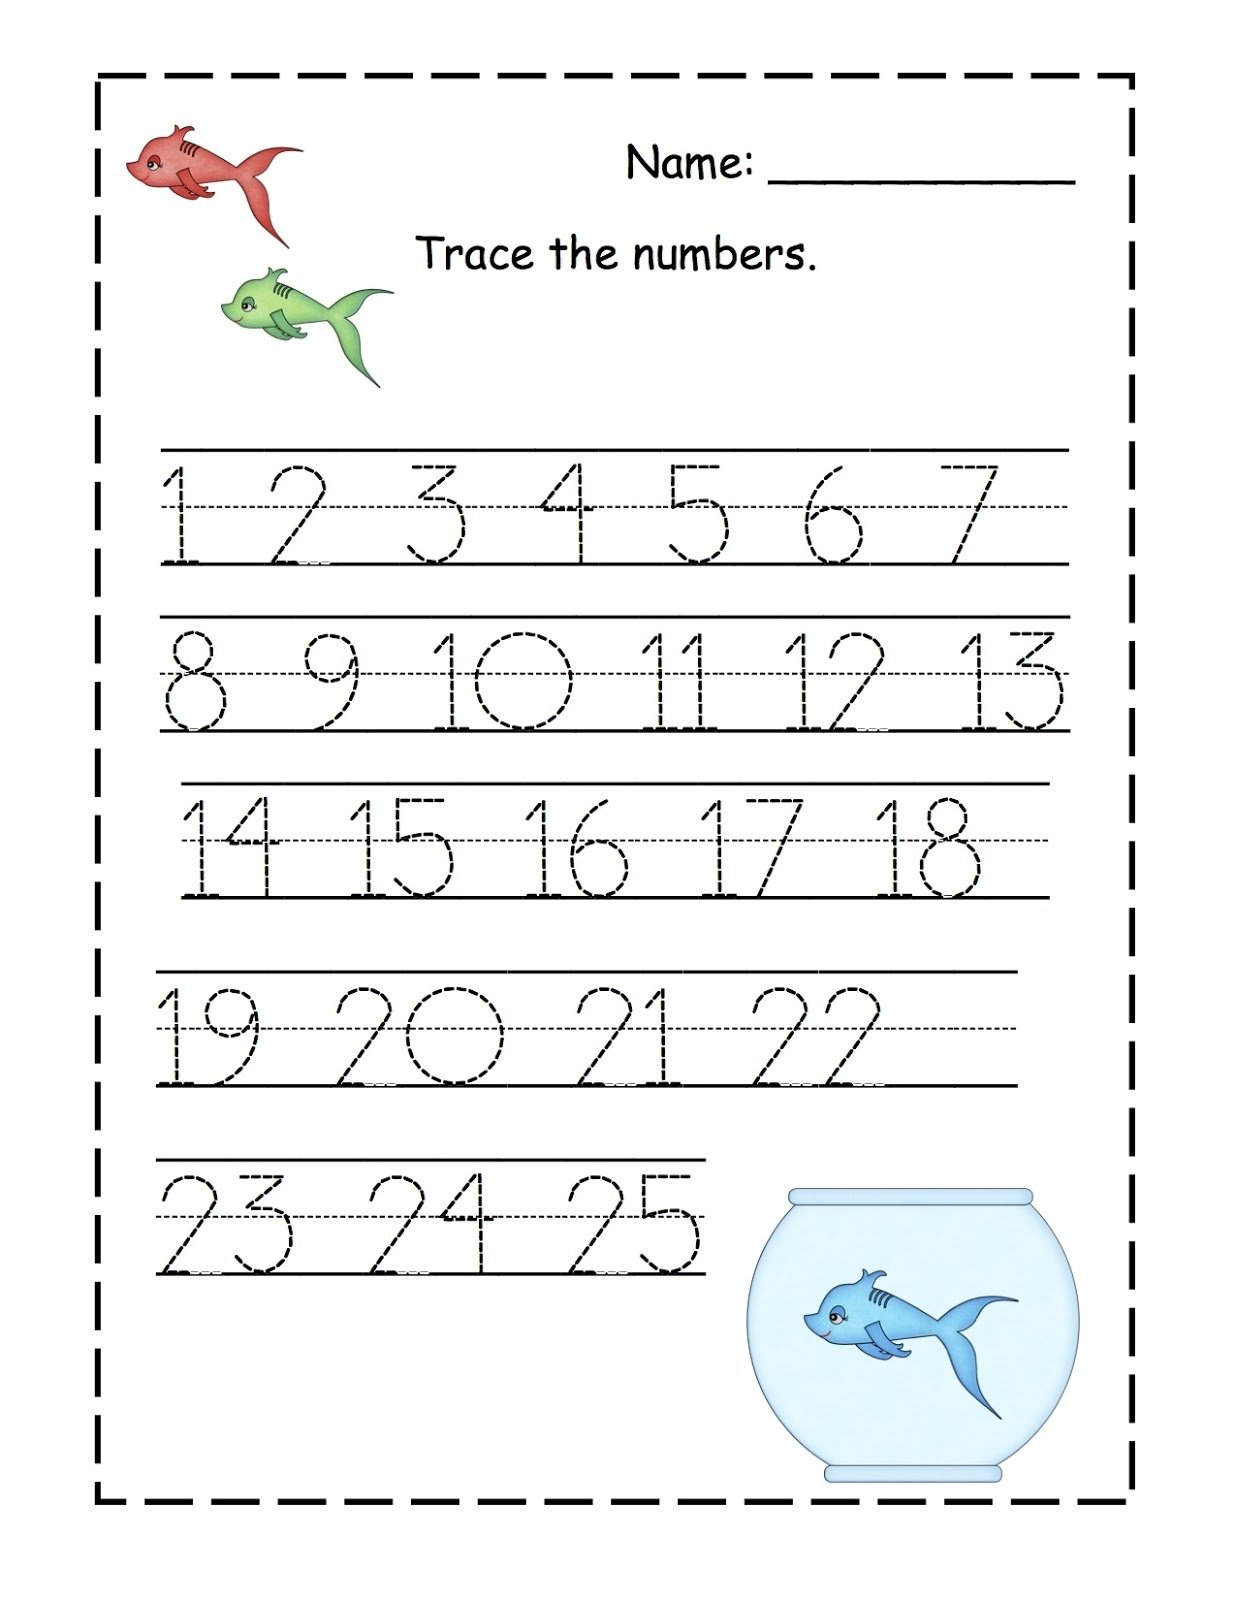 Printable Preschool Numbers 1 31 – Calendar Inspiration Design Numbers 1 To 31 Printable